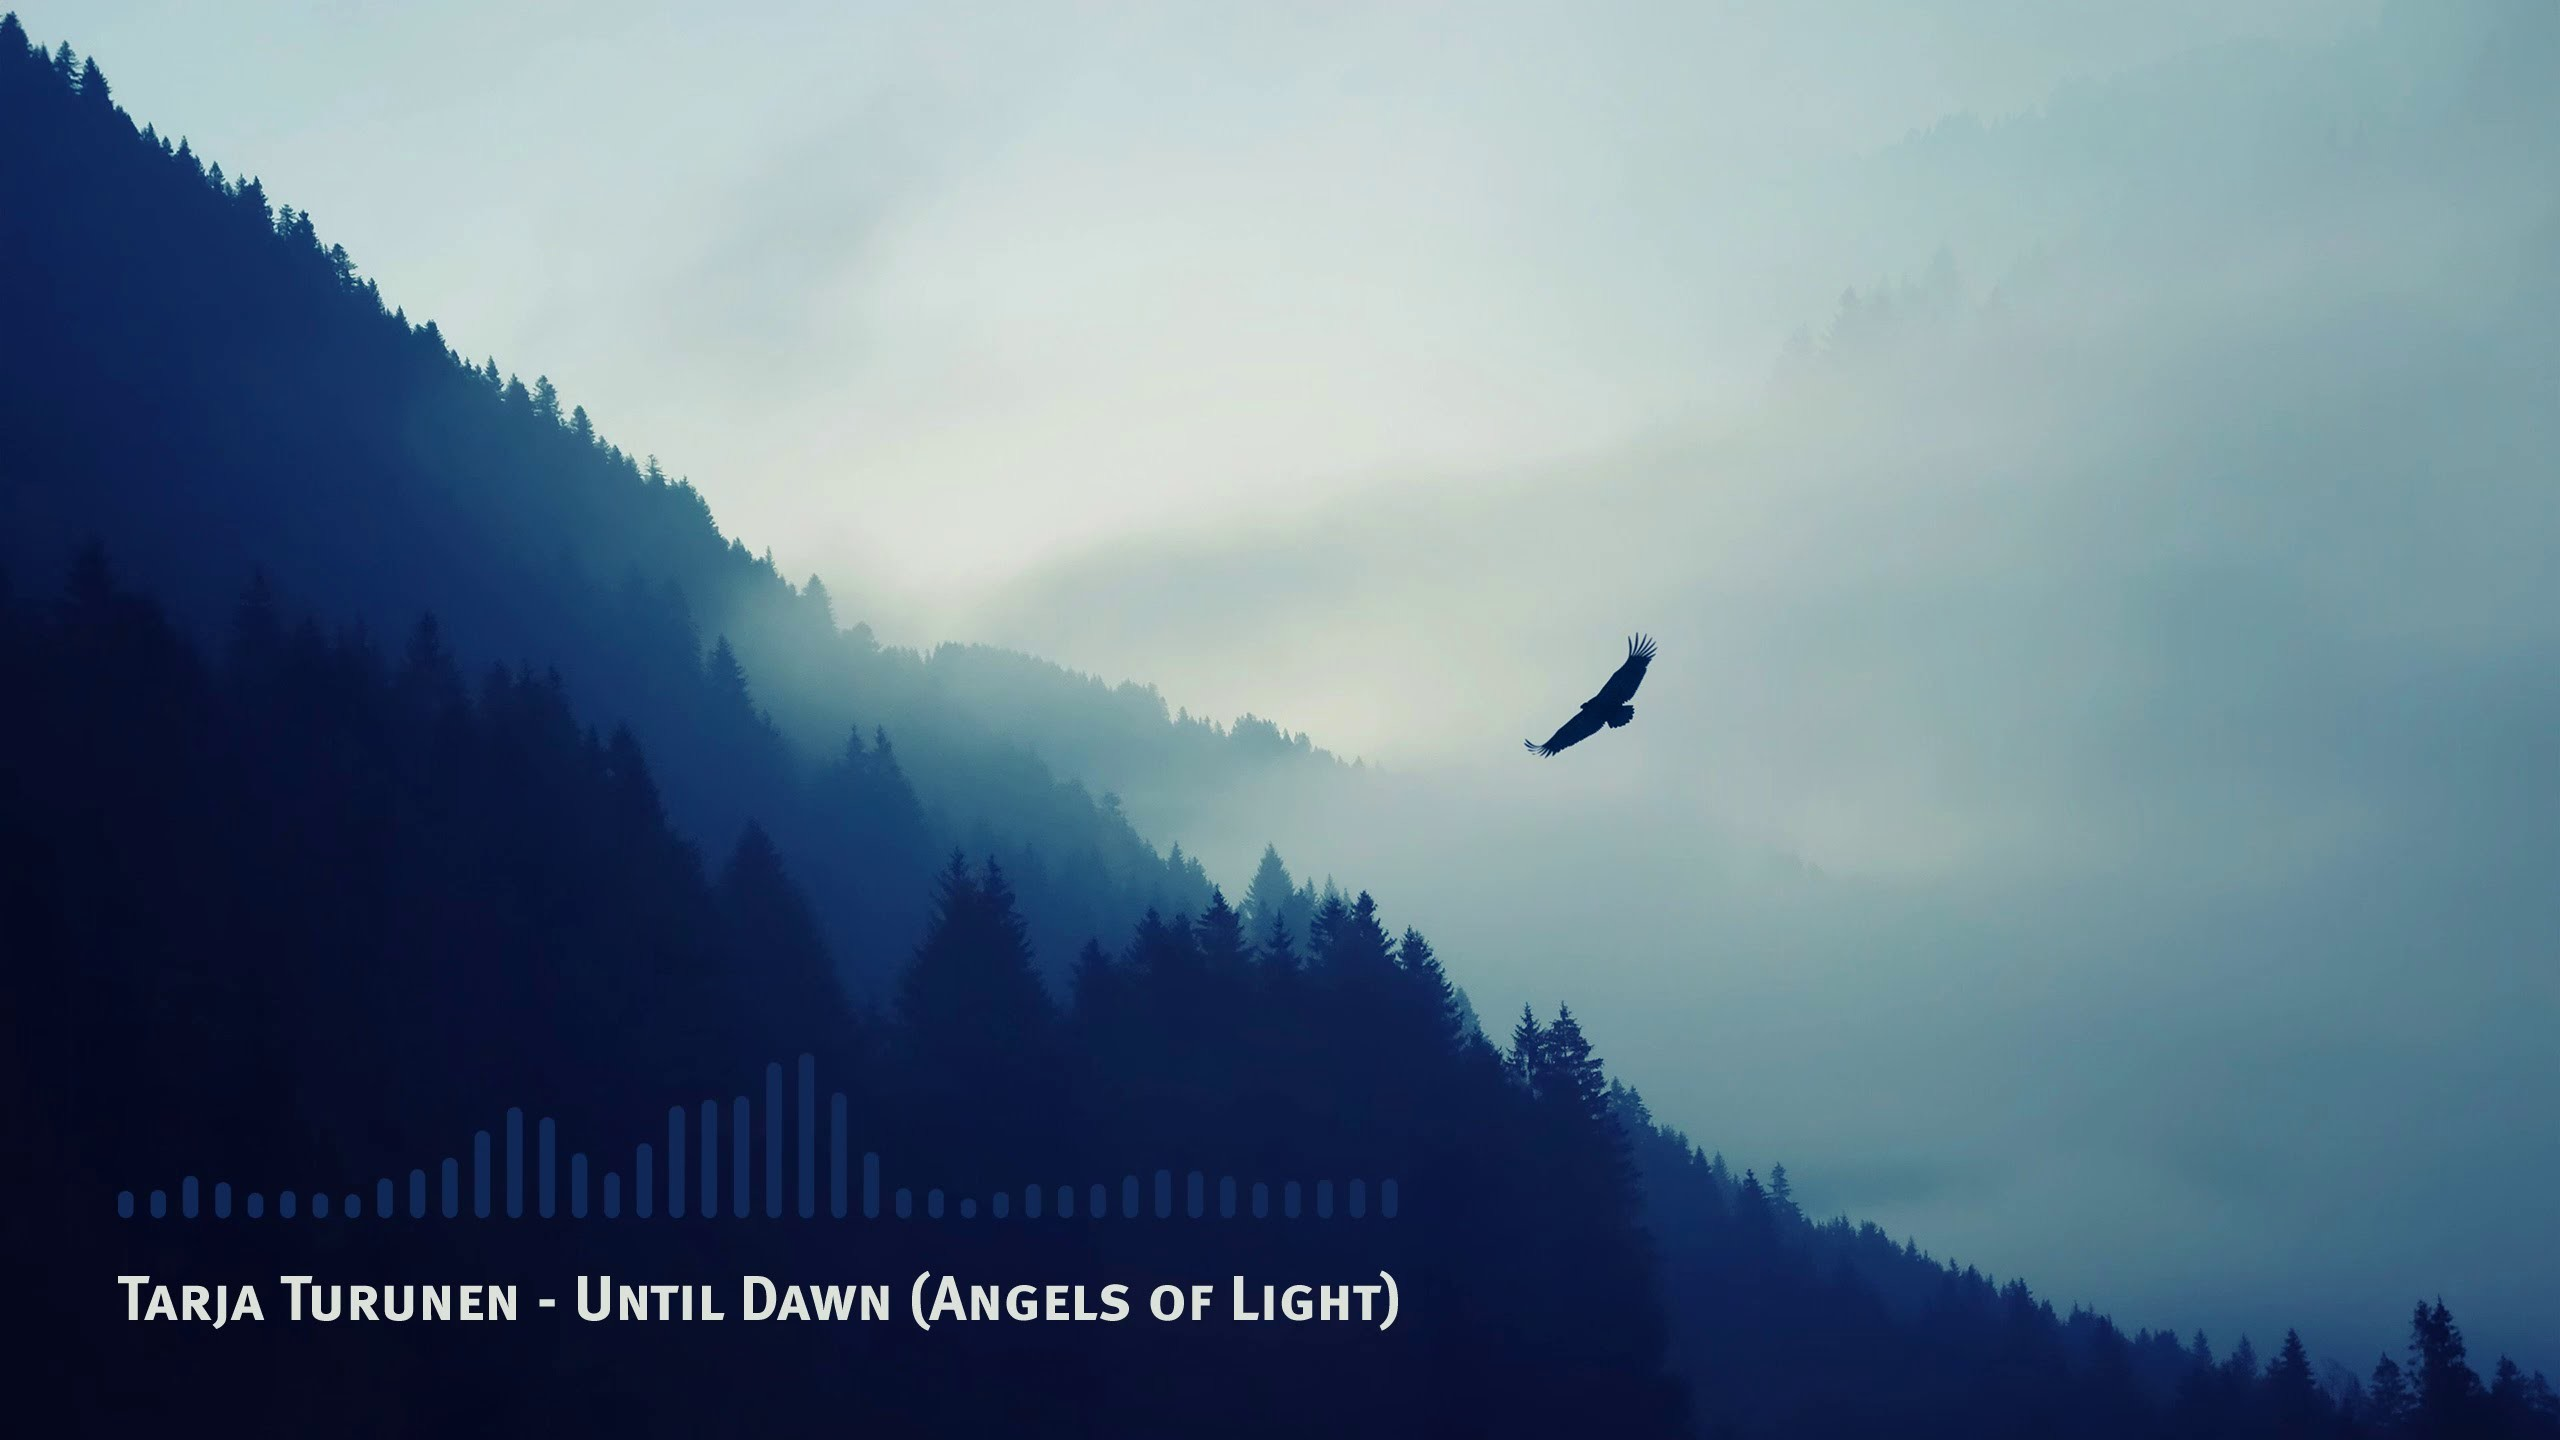 Tarja Turunen – Until Dawn (Angels of Light)